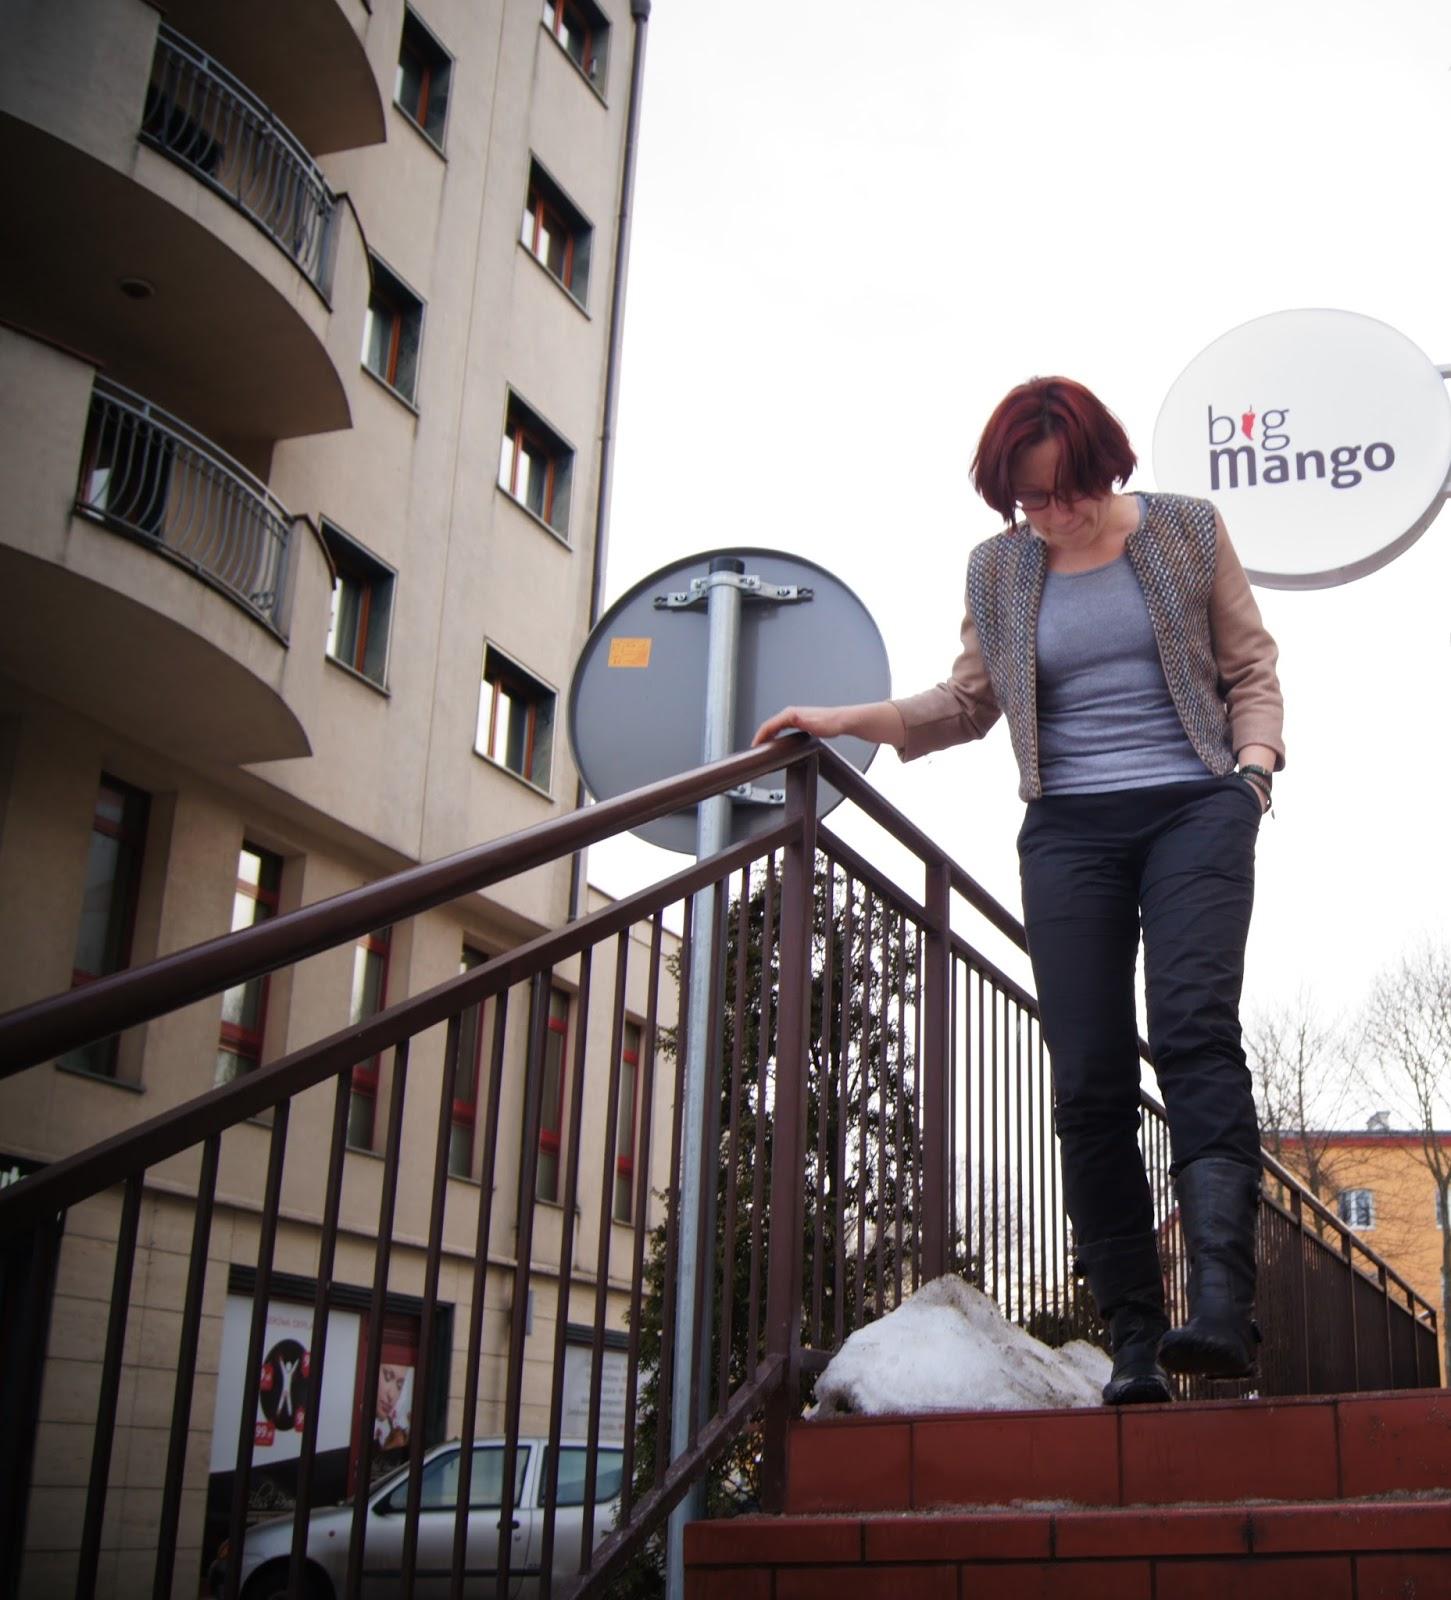 http://lolajoo.blogspot.com/2014/03/zakiet-stroniacy-od-zdjec.html